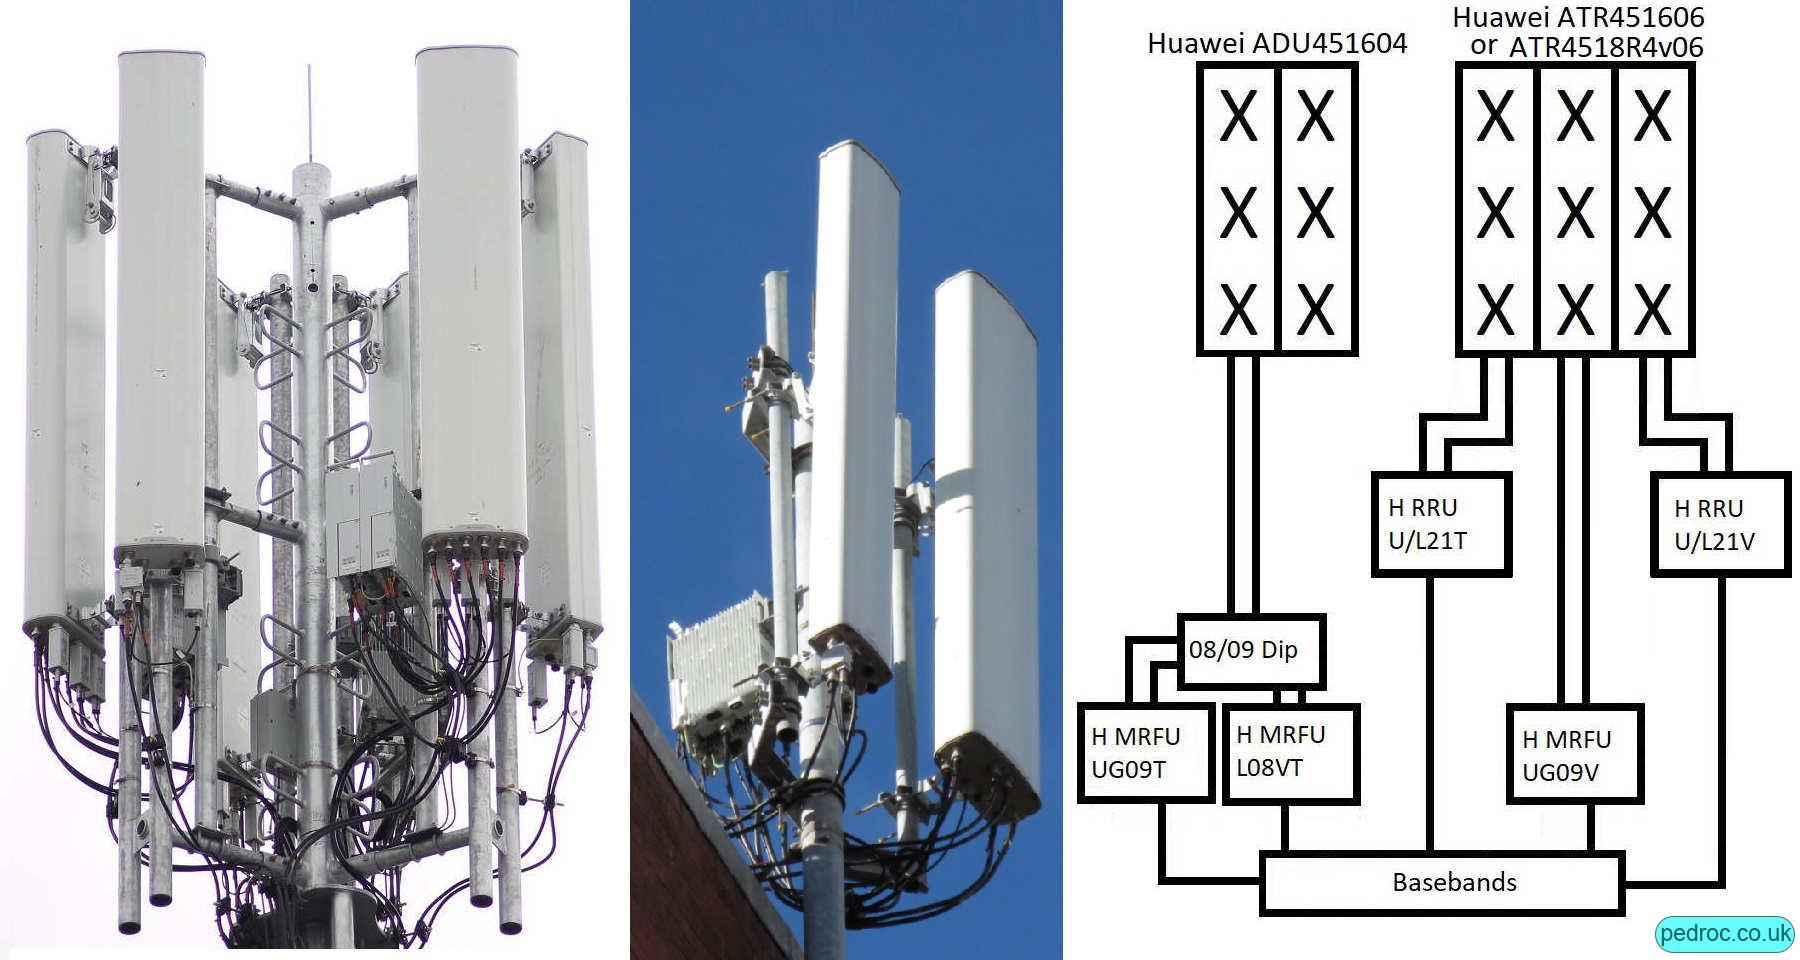 Vodafone Huawei medium site with Huawei ADU451604 and ATR451606 antennas and Huawei 2100MHz RRUs.